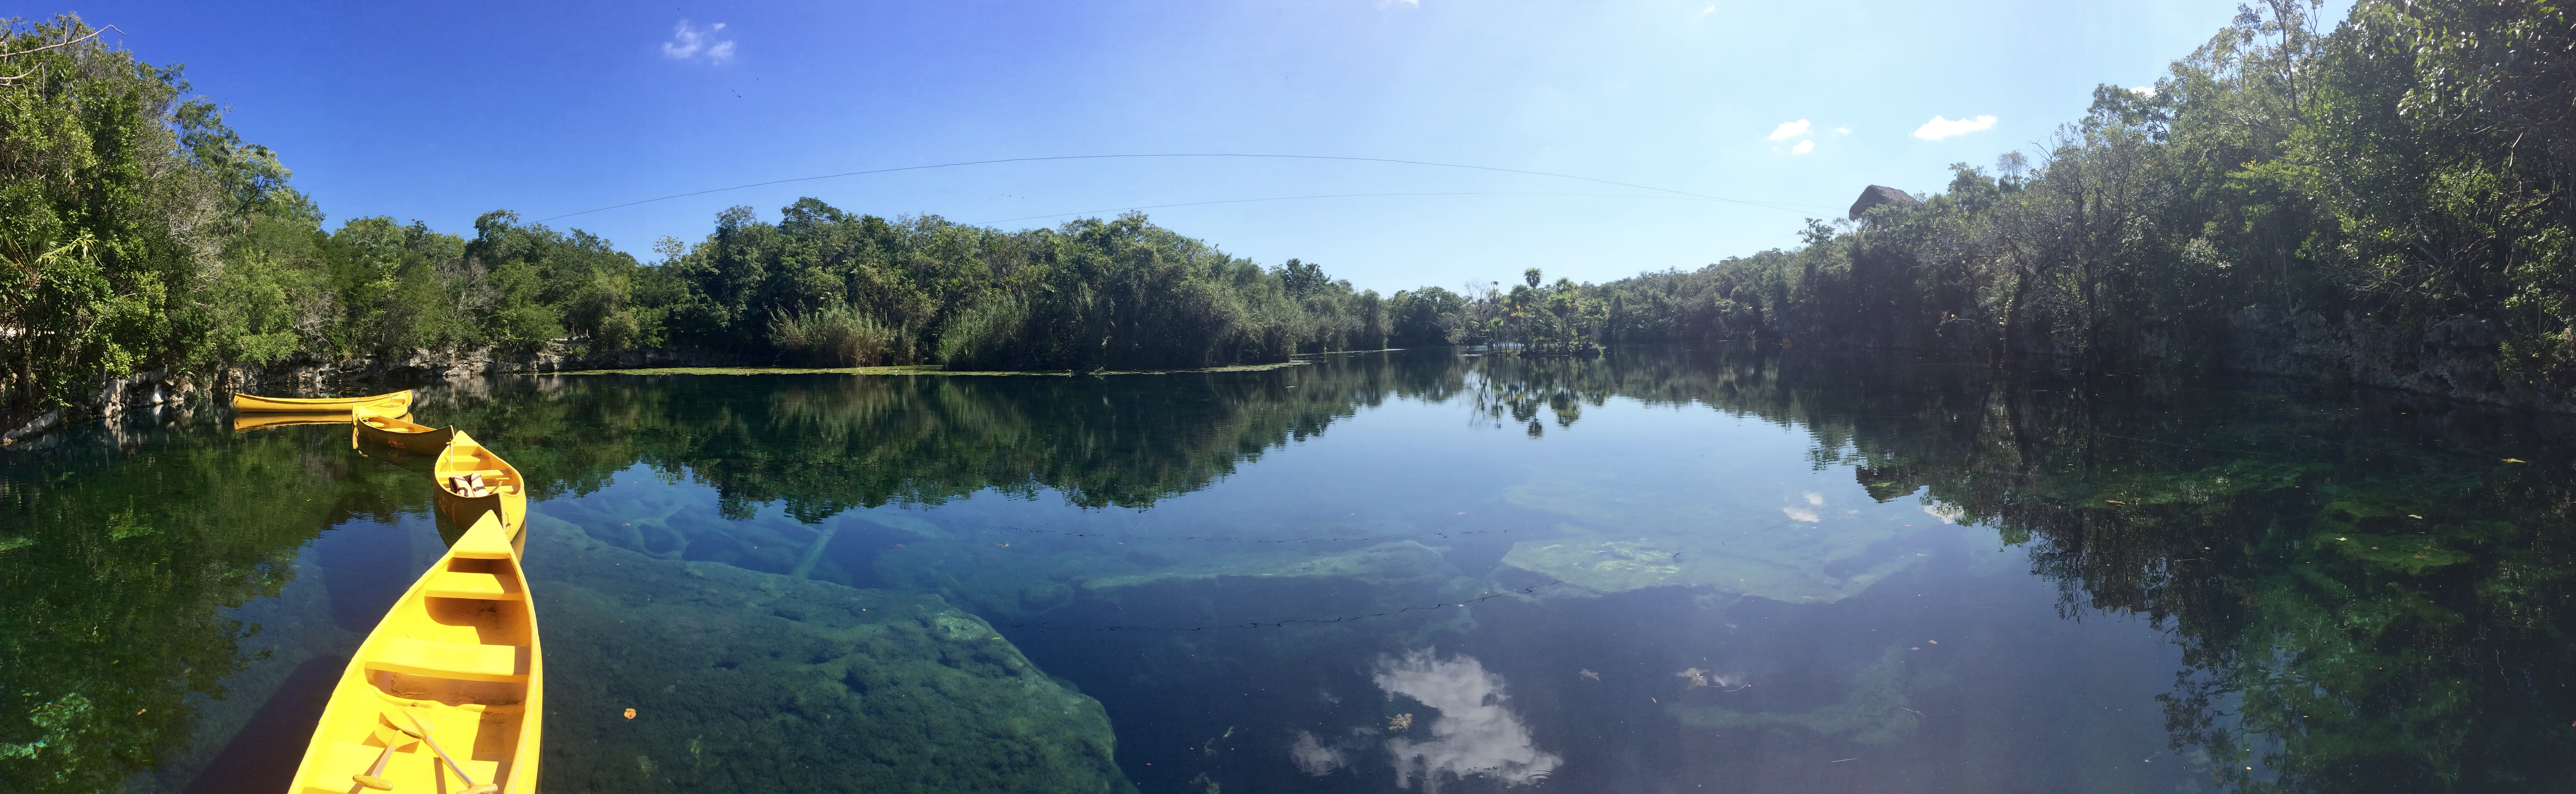 Cenote à tankah